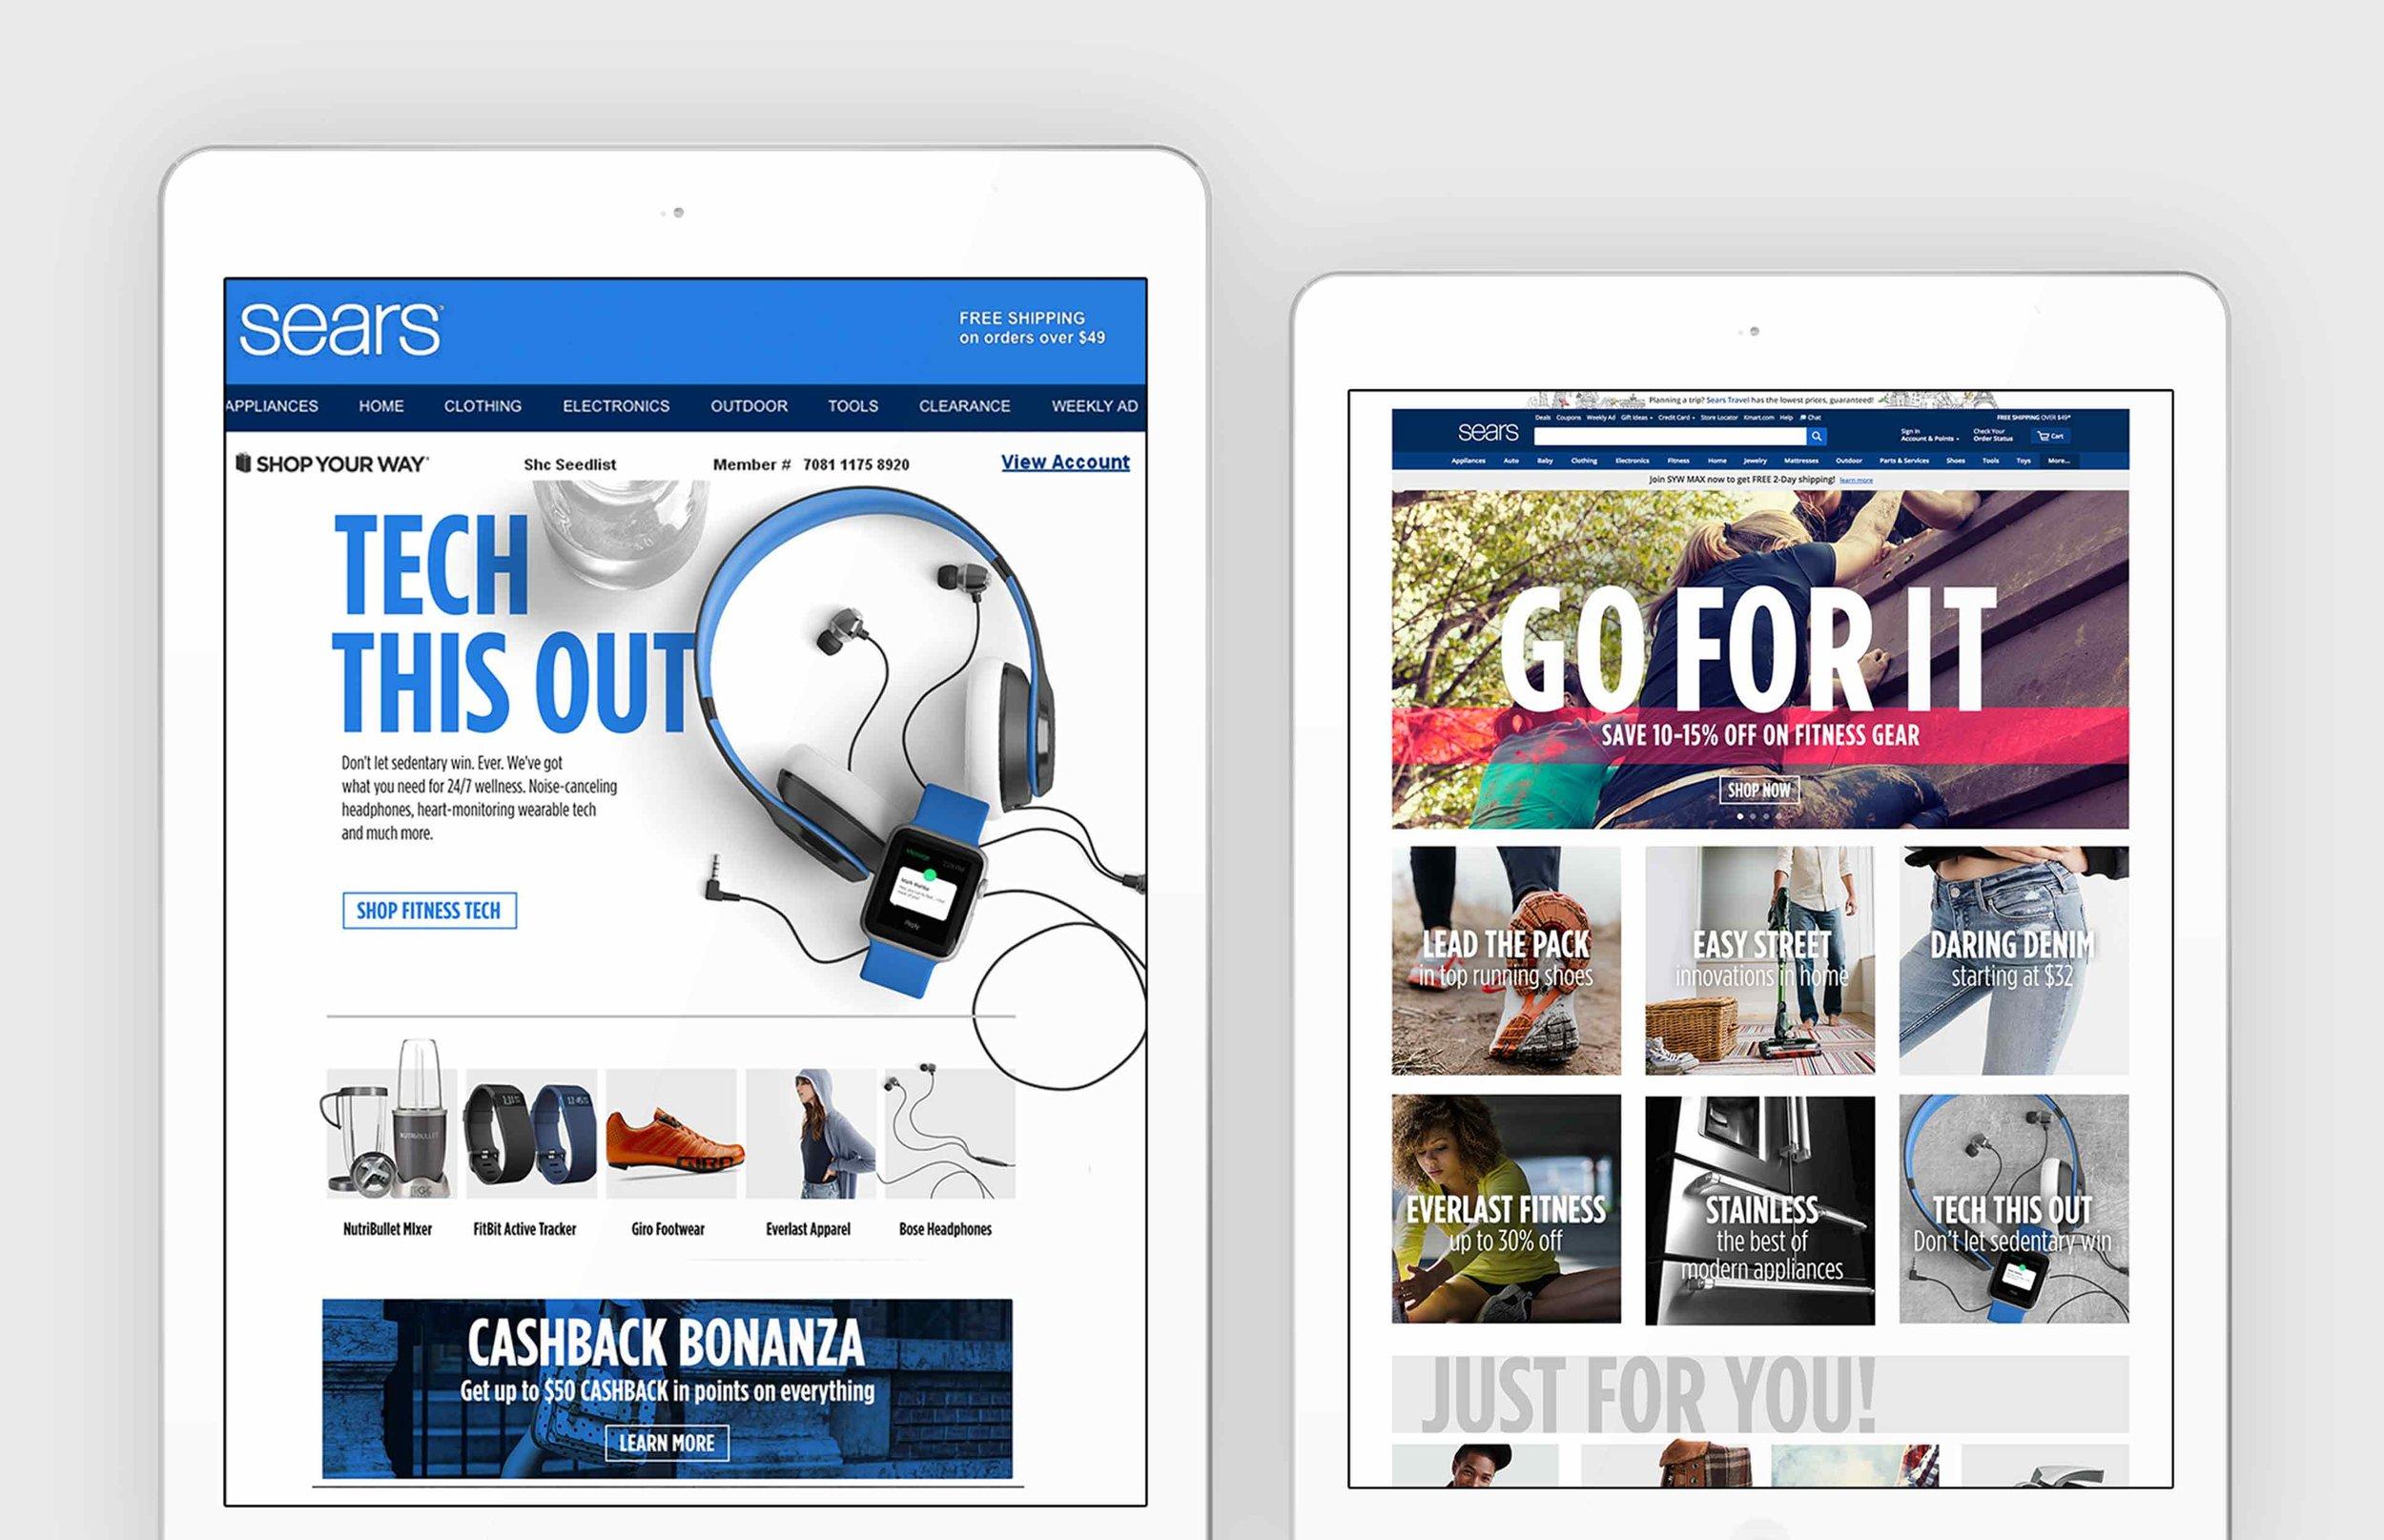 Sears_Rebrand_Email_Webpage.jpg